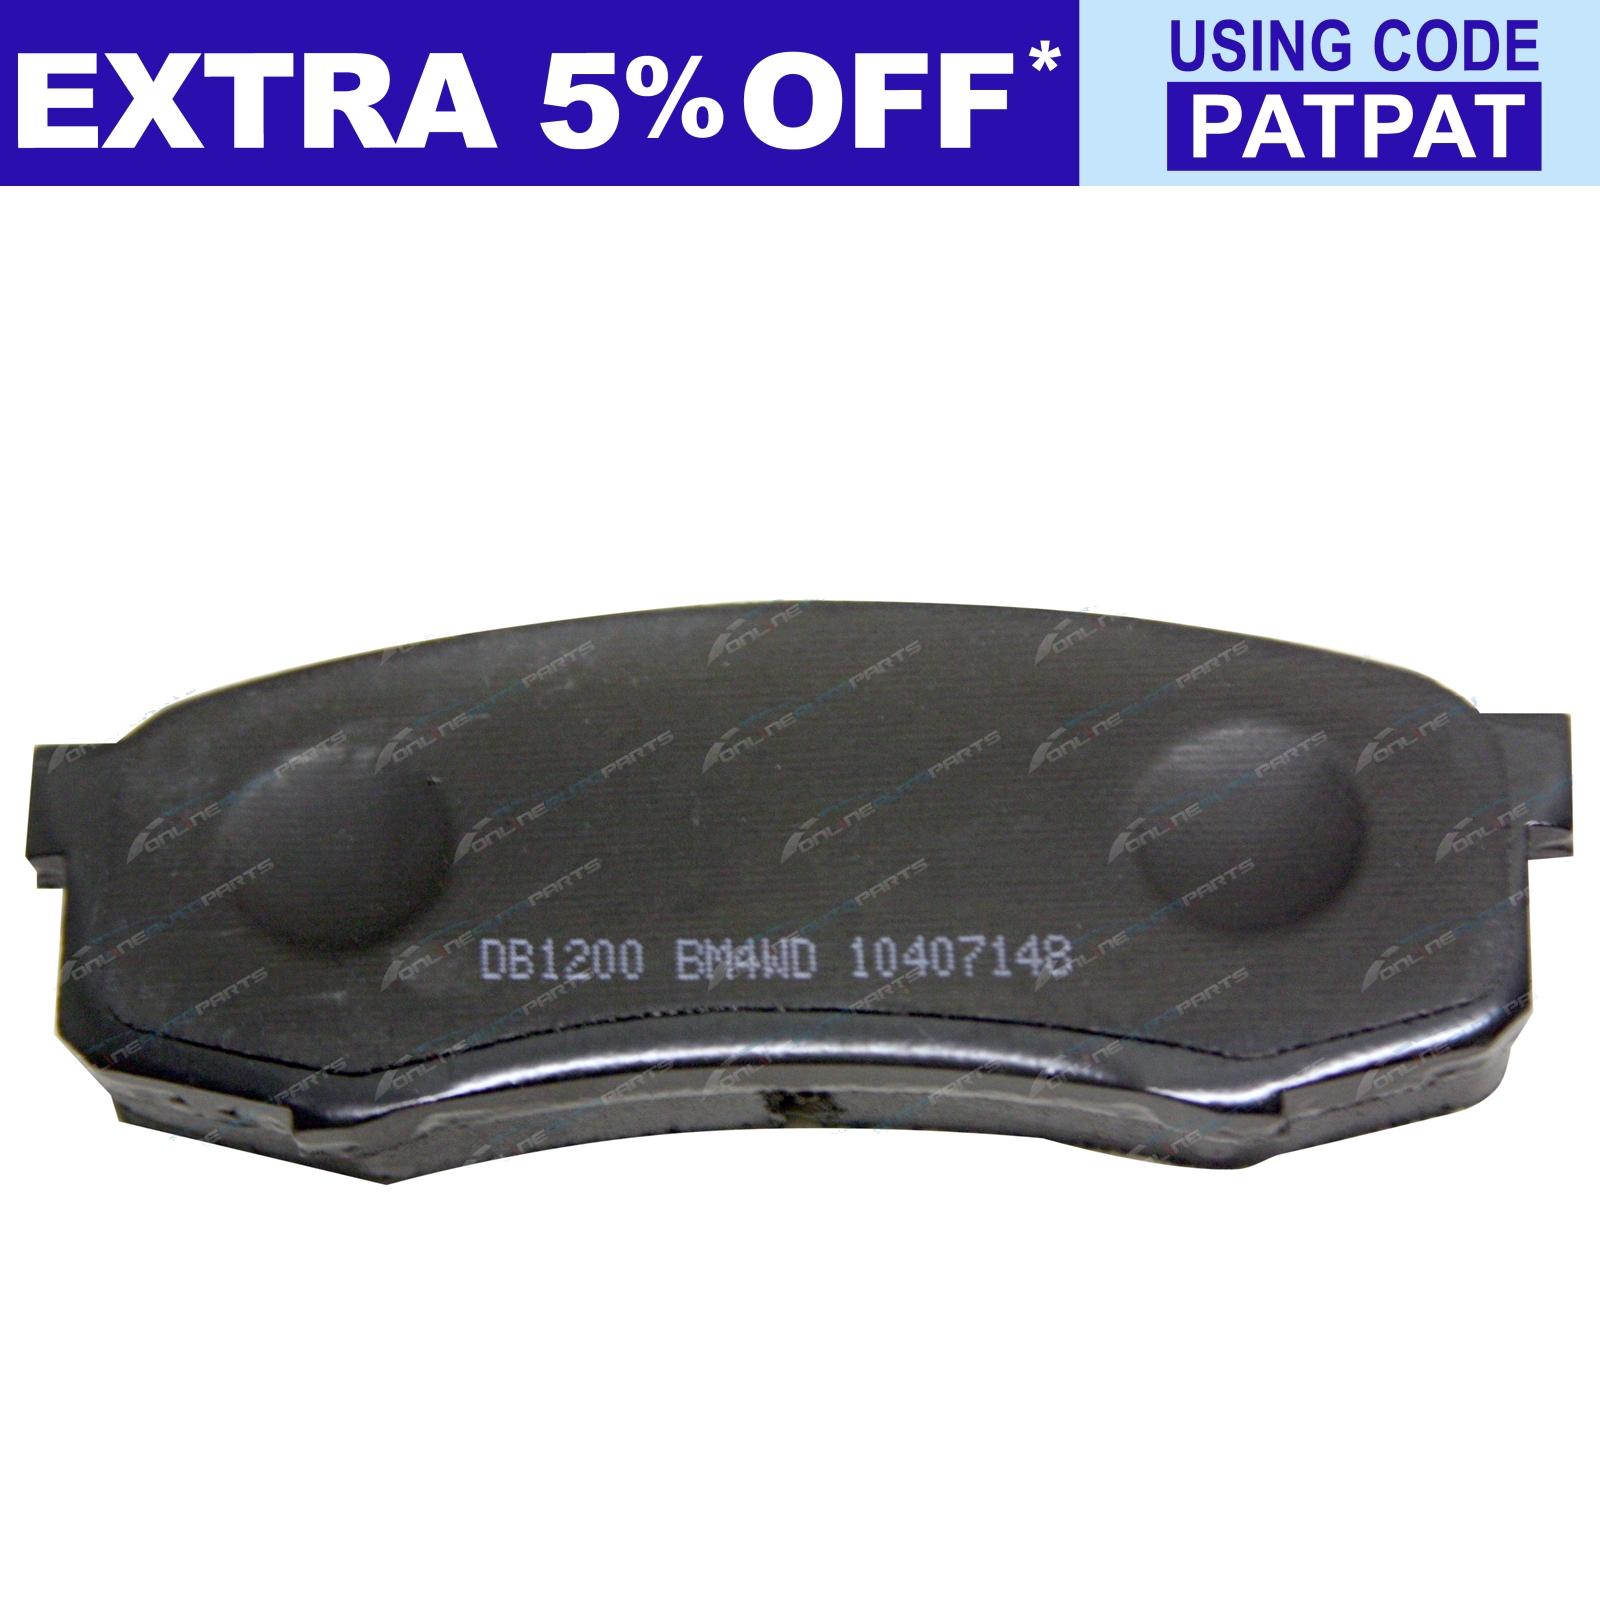 Rear-Disc-Brake-Pads-Bendix-suits-Landcruiser-75-78-79-Series-4x4-80-105-70 thumbnail 3